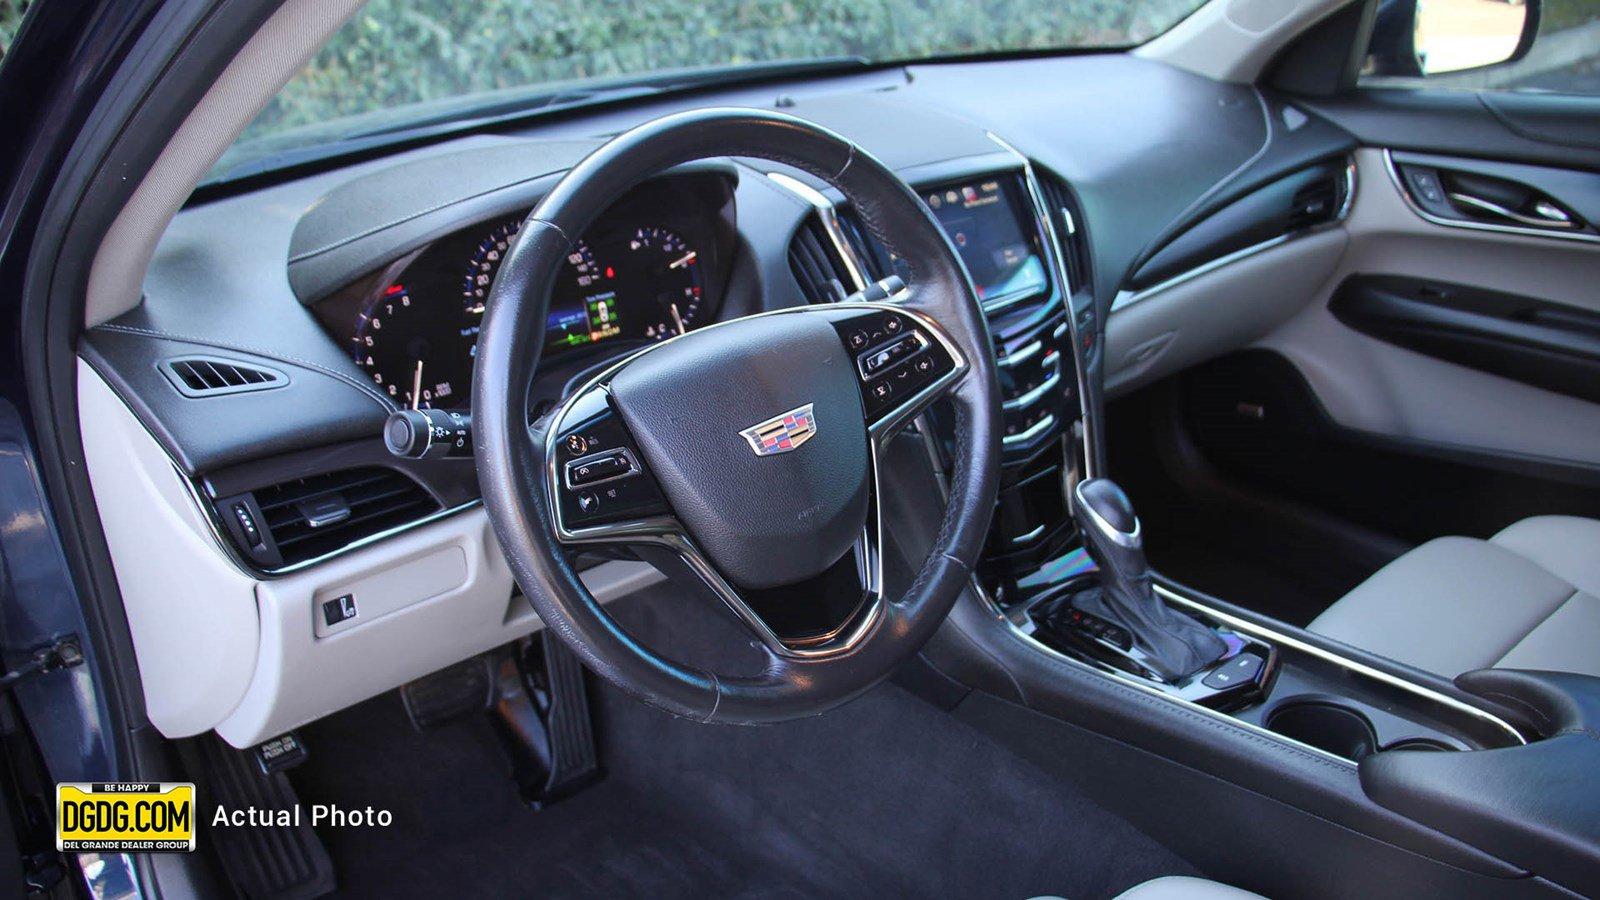 Pre-Owned 2016 Cadillac ATS Sedan Standard RWD